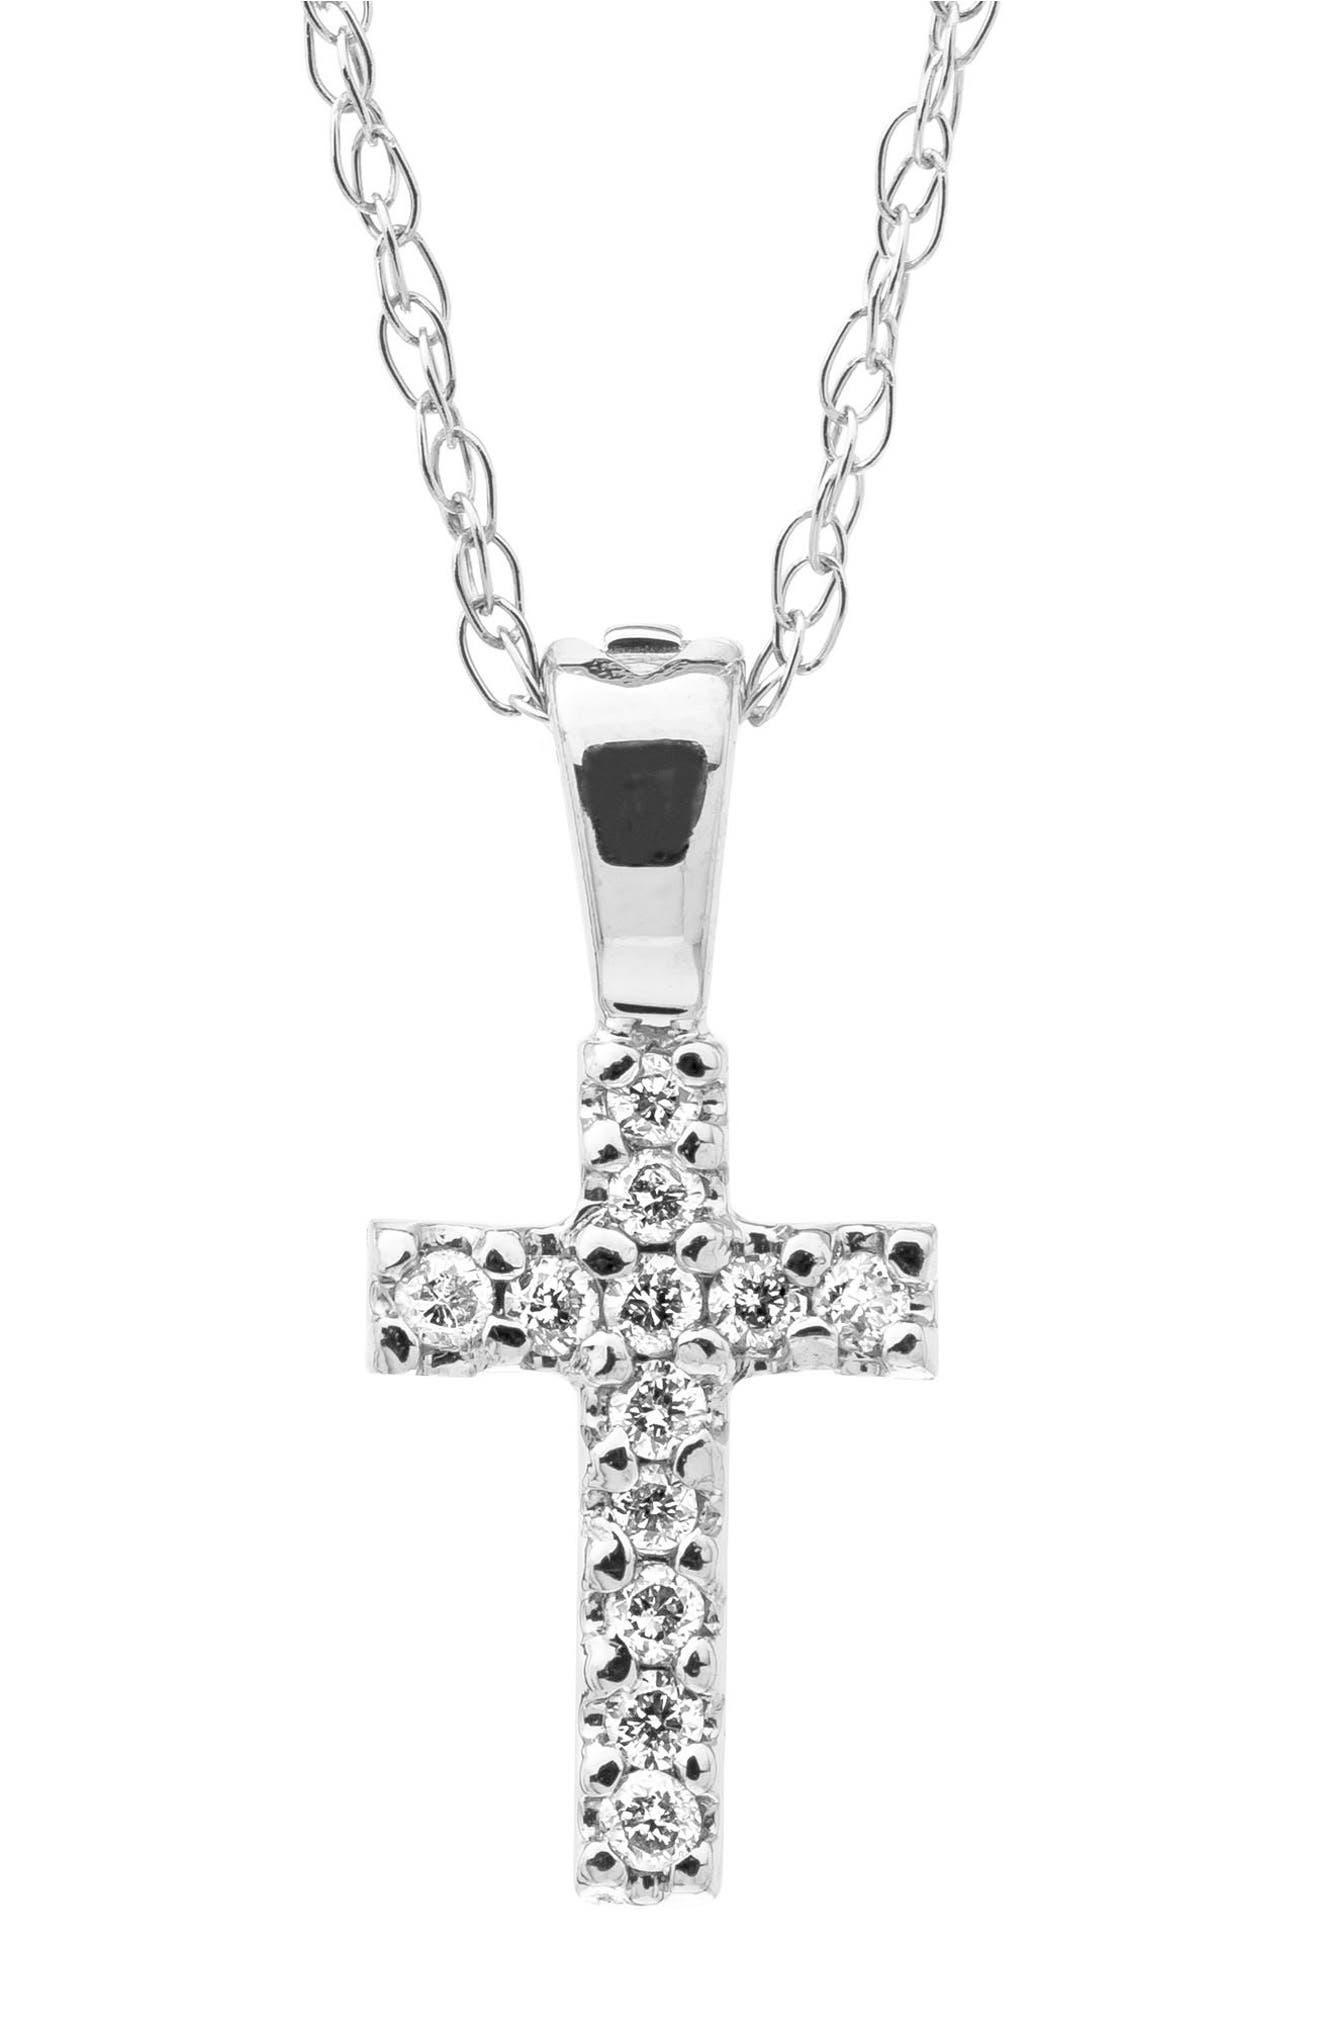 14k White Gold & Diamond Cross Necklace,                         Main,                         color, WHITE